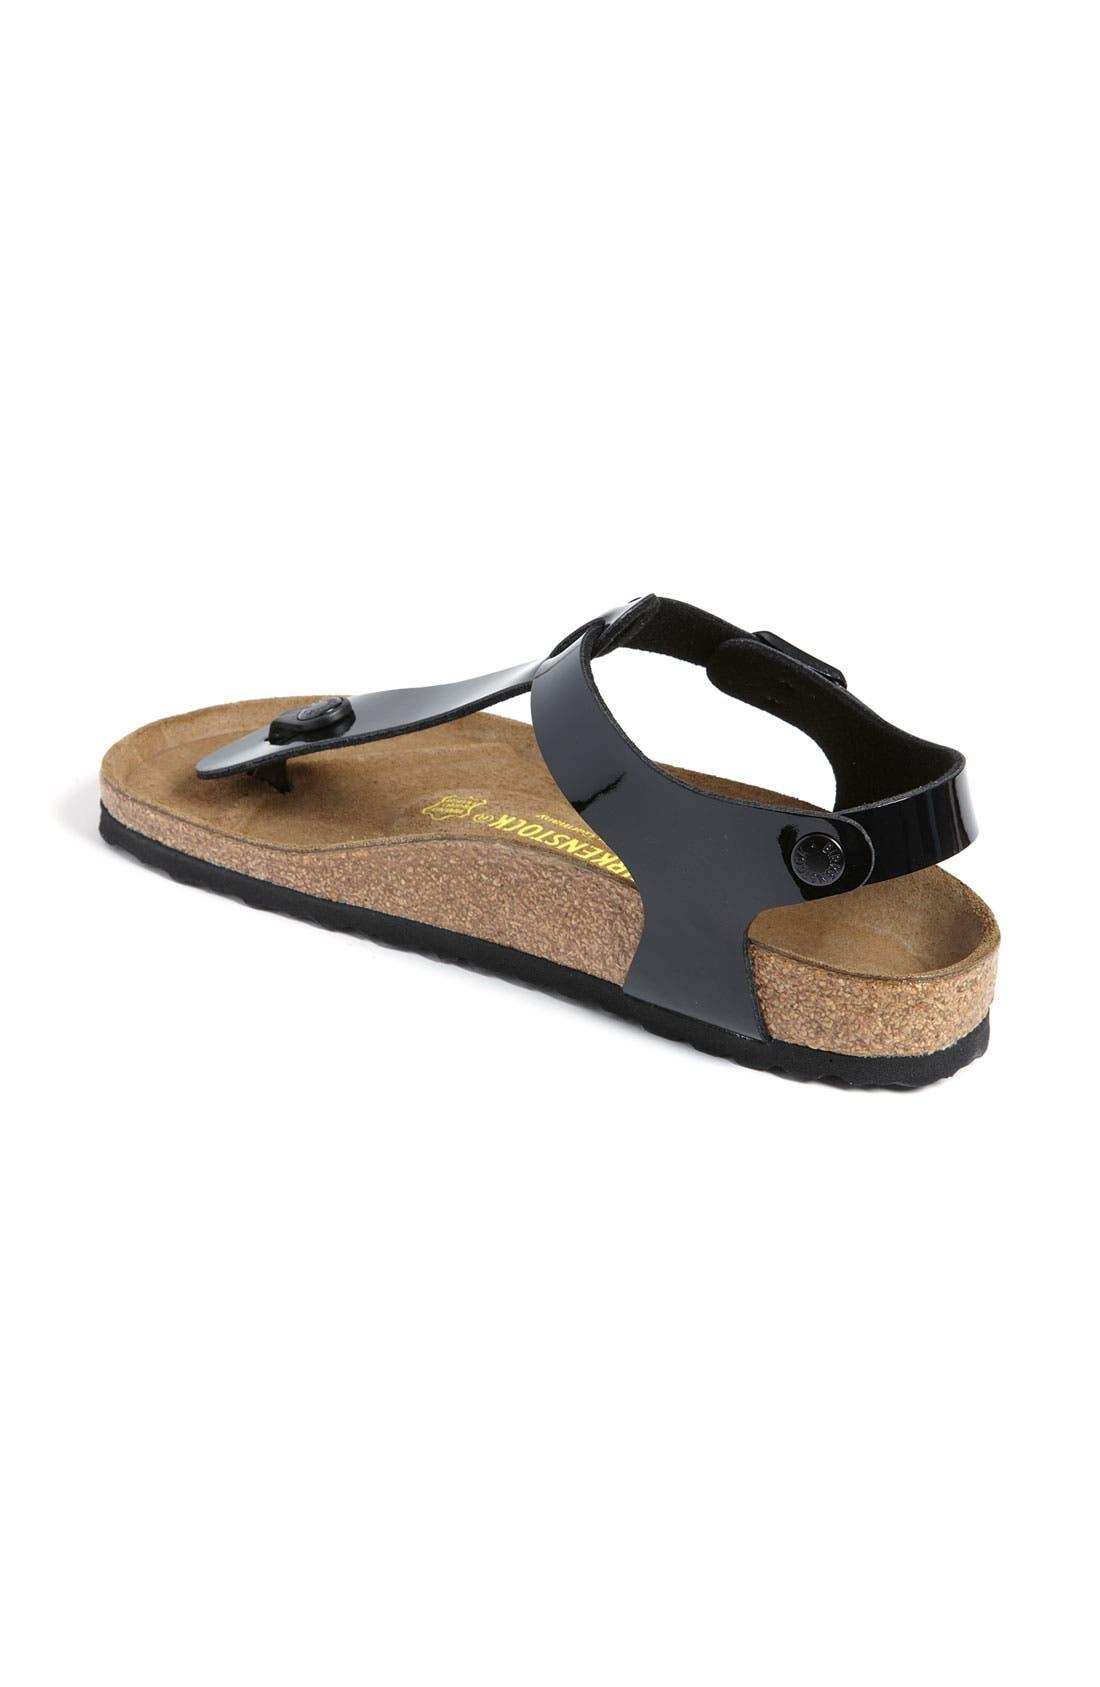 Alternate Image 2  - Birkenstock 'Kairo' Birko-Flor™ Sandal (Women)